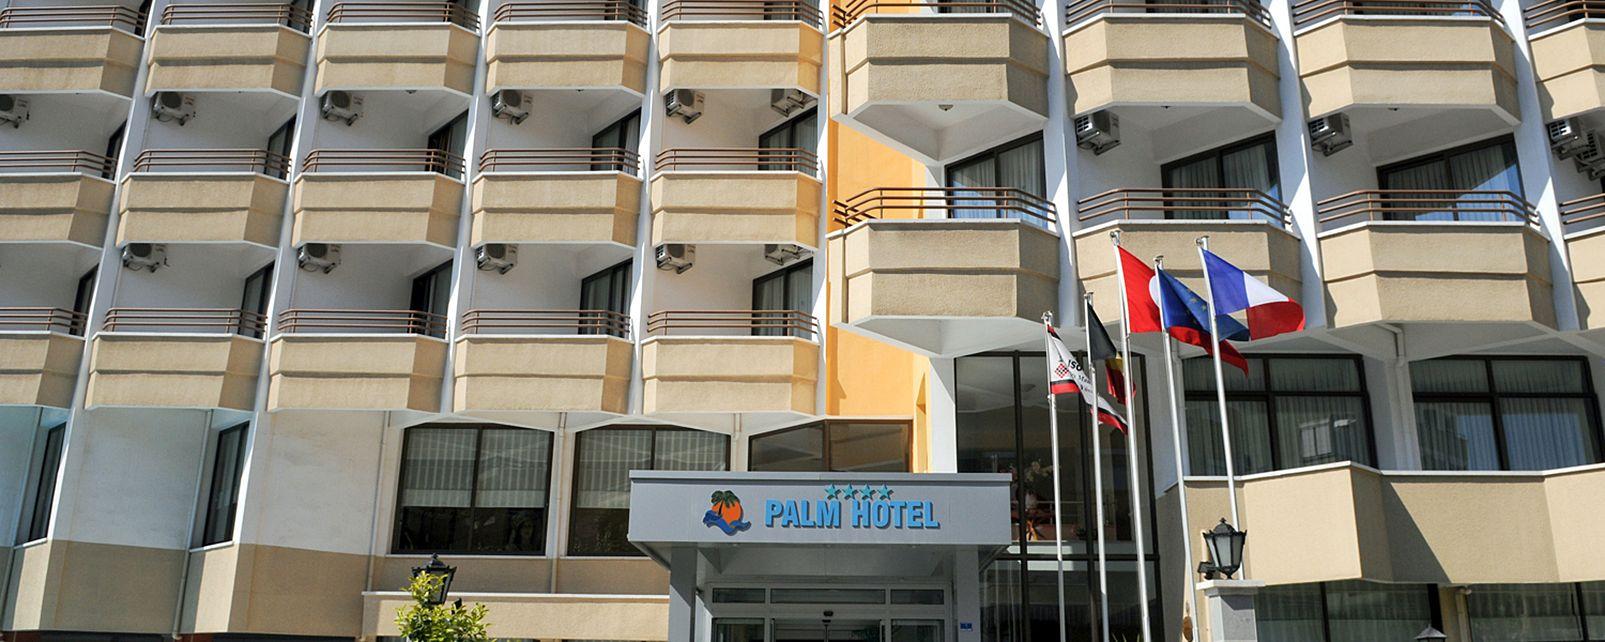 Hotel Palm Hotel